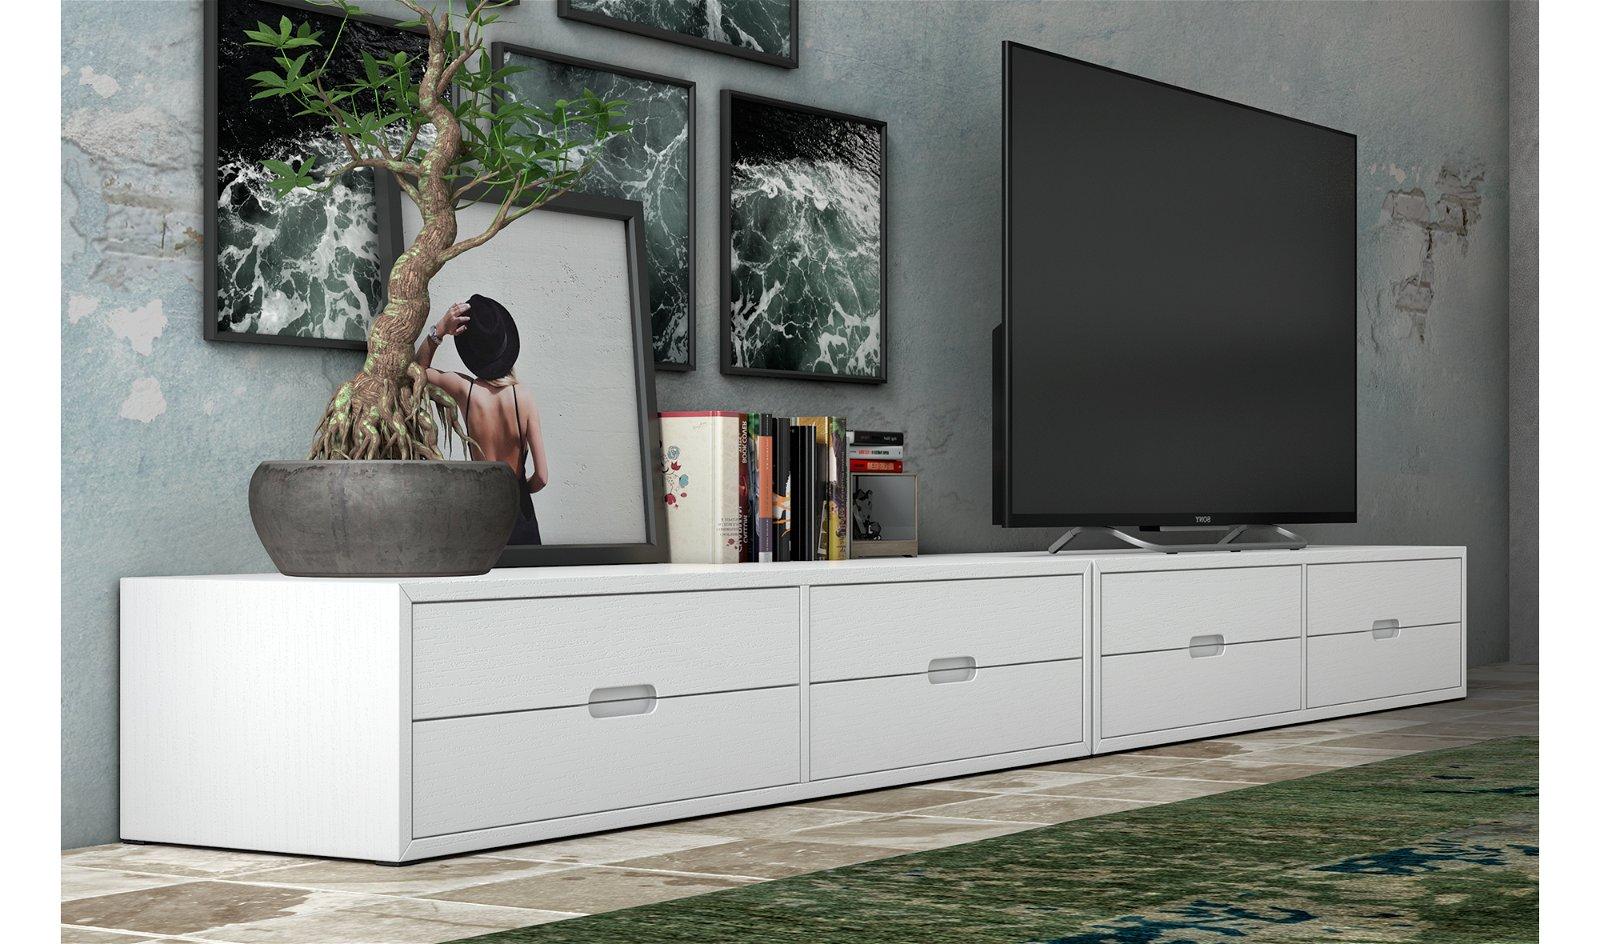 Mueble tv bajo industrial Loft